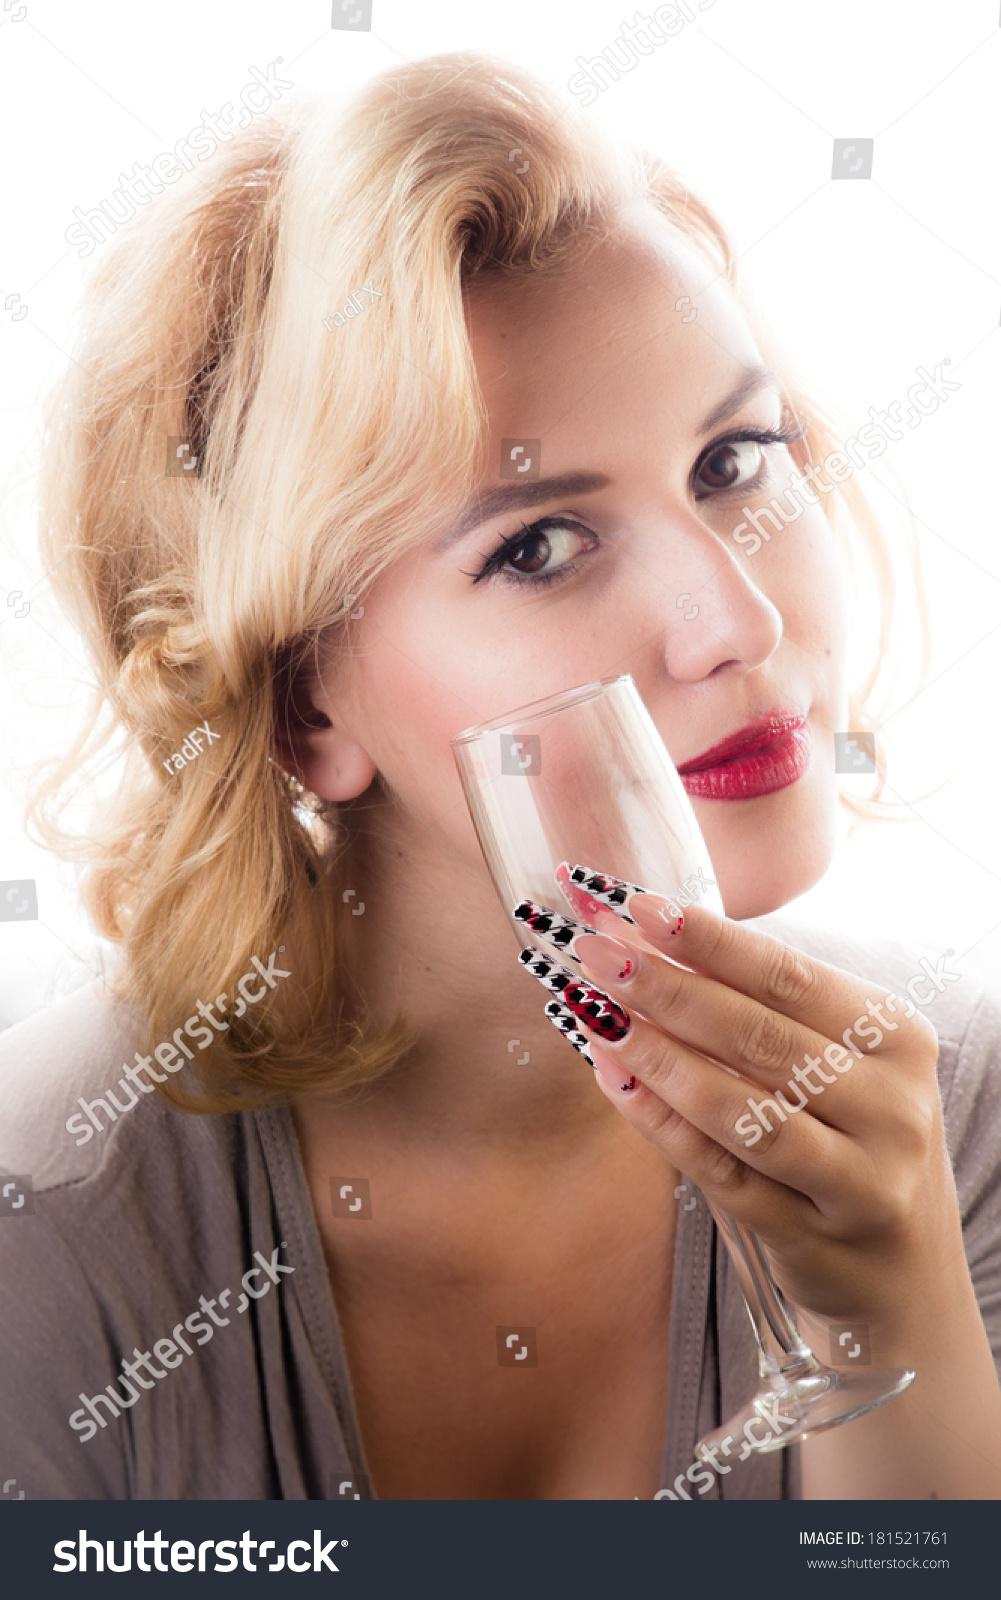 Beauty Girl Sensual Red Lips Long Stock Photo 181521761 - Shutterstock